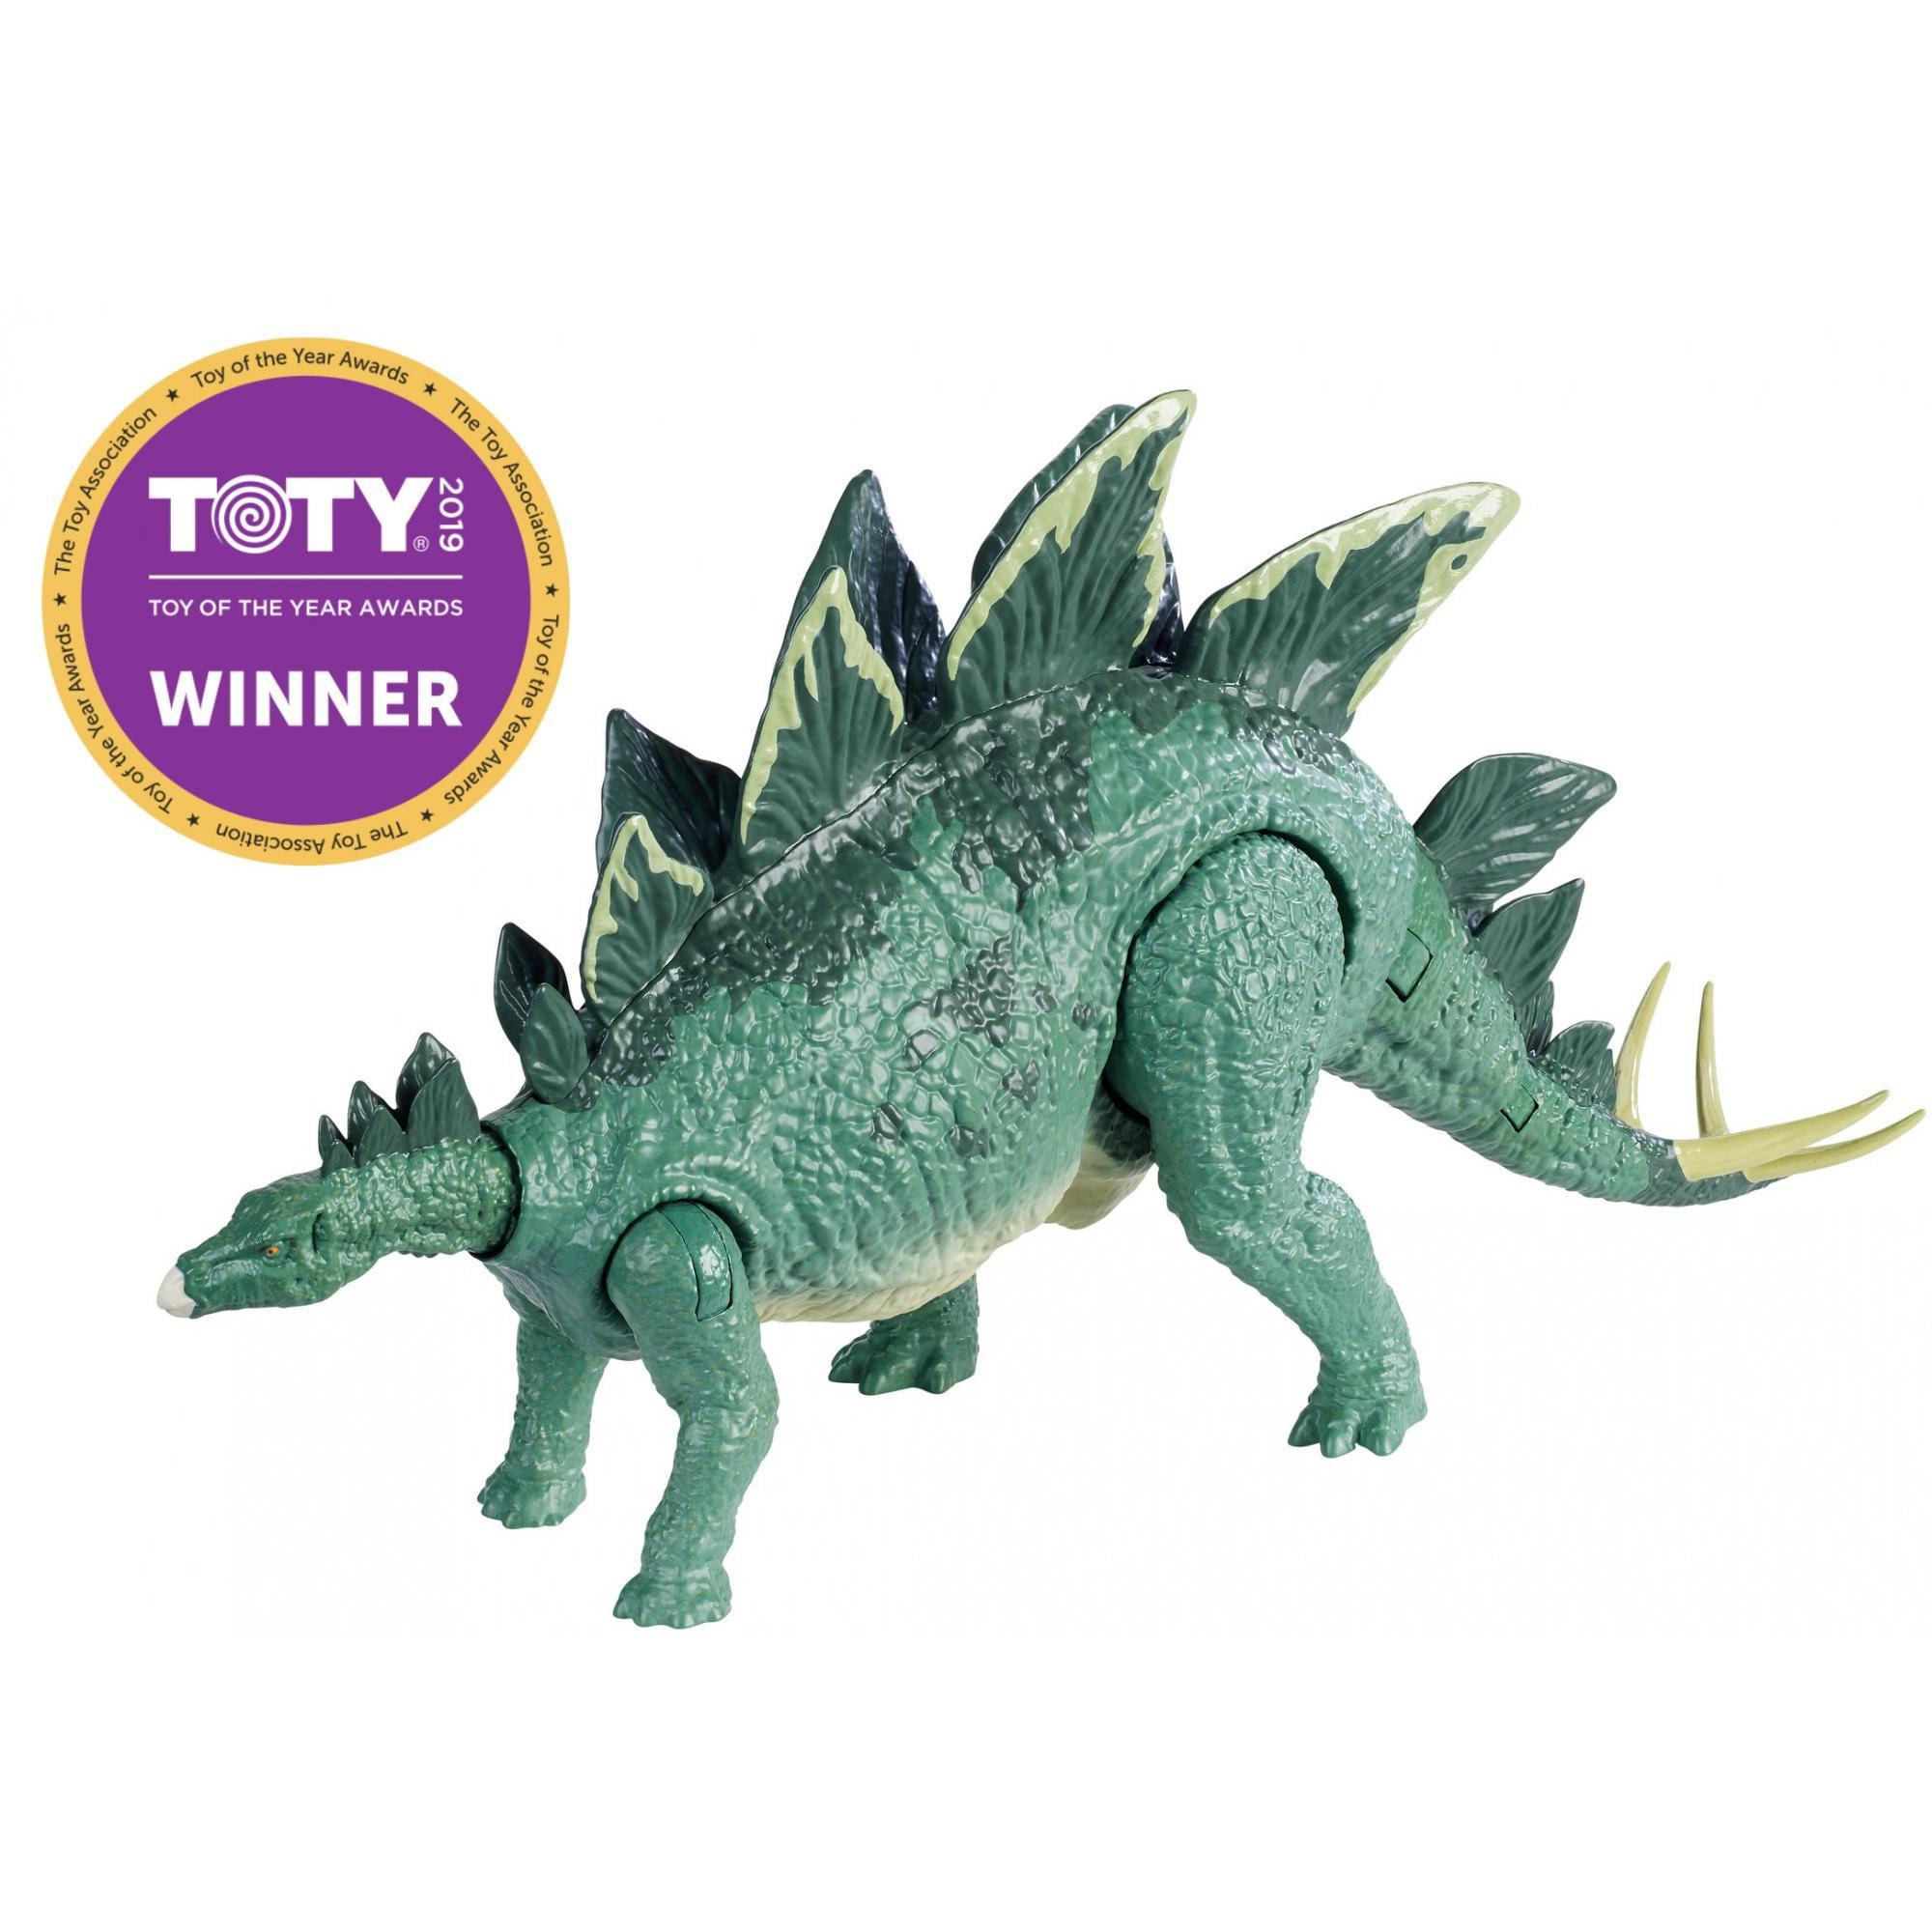 Jurassic World Action Attack Stegosaurus Dinosaur for Ages 4Y+ by Jurassic World